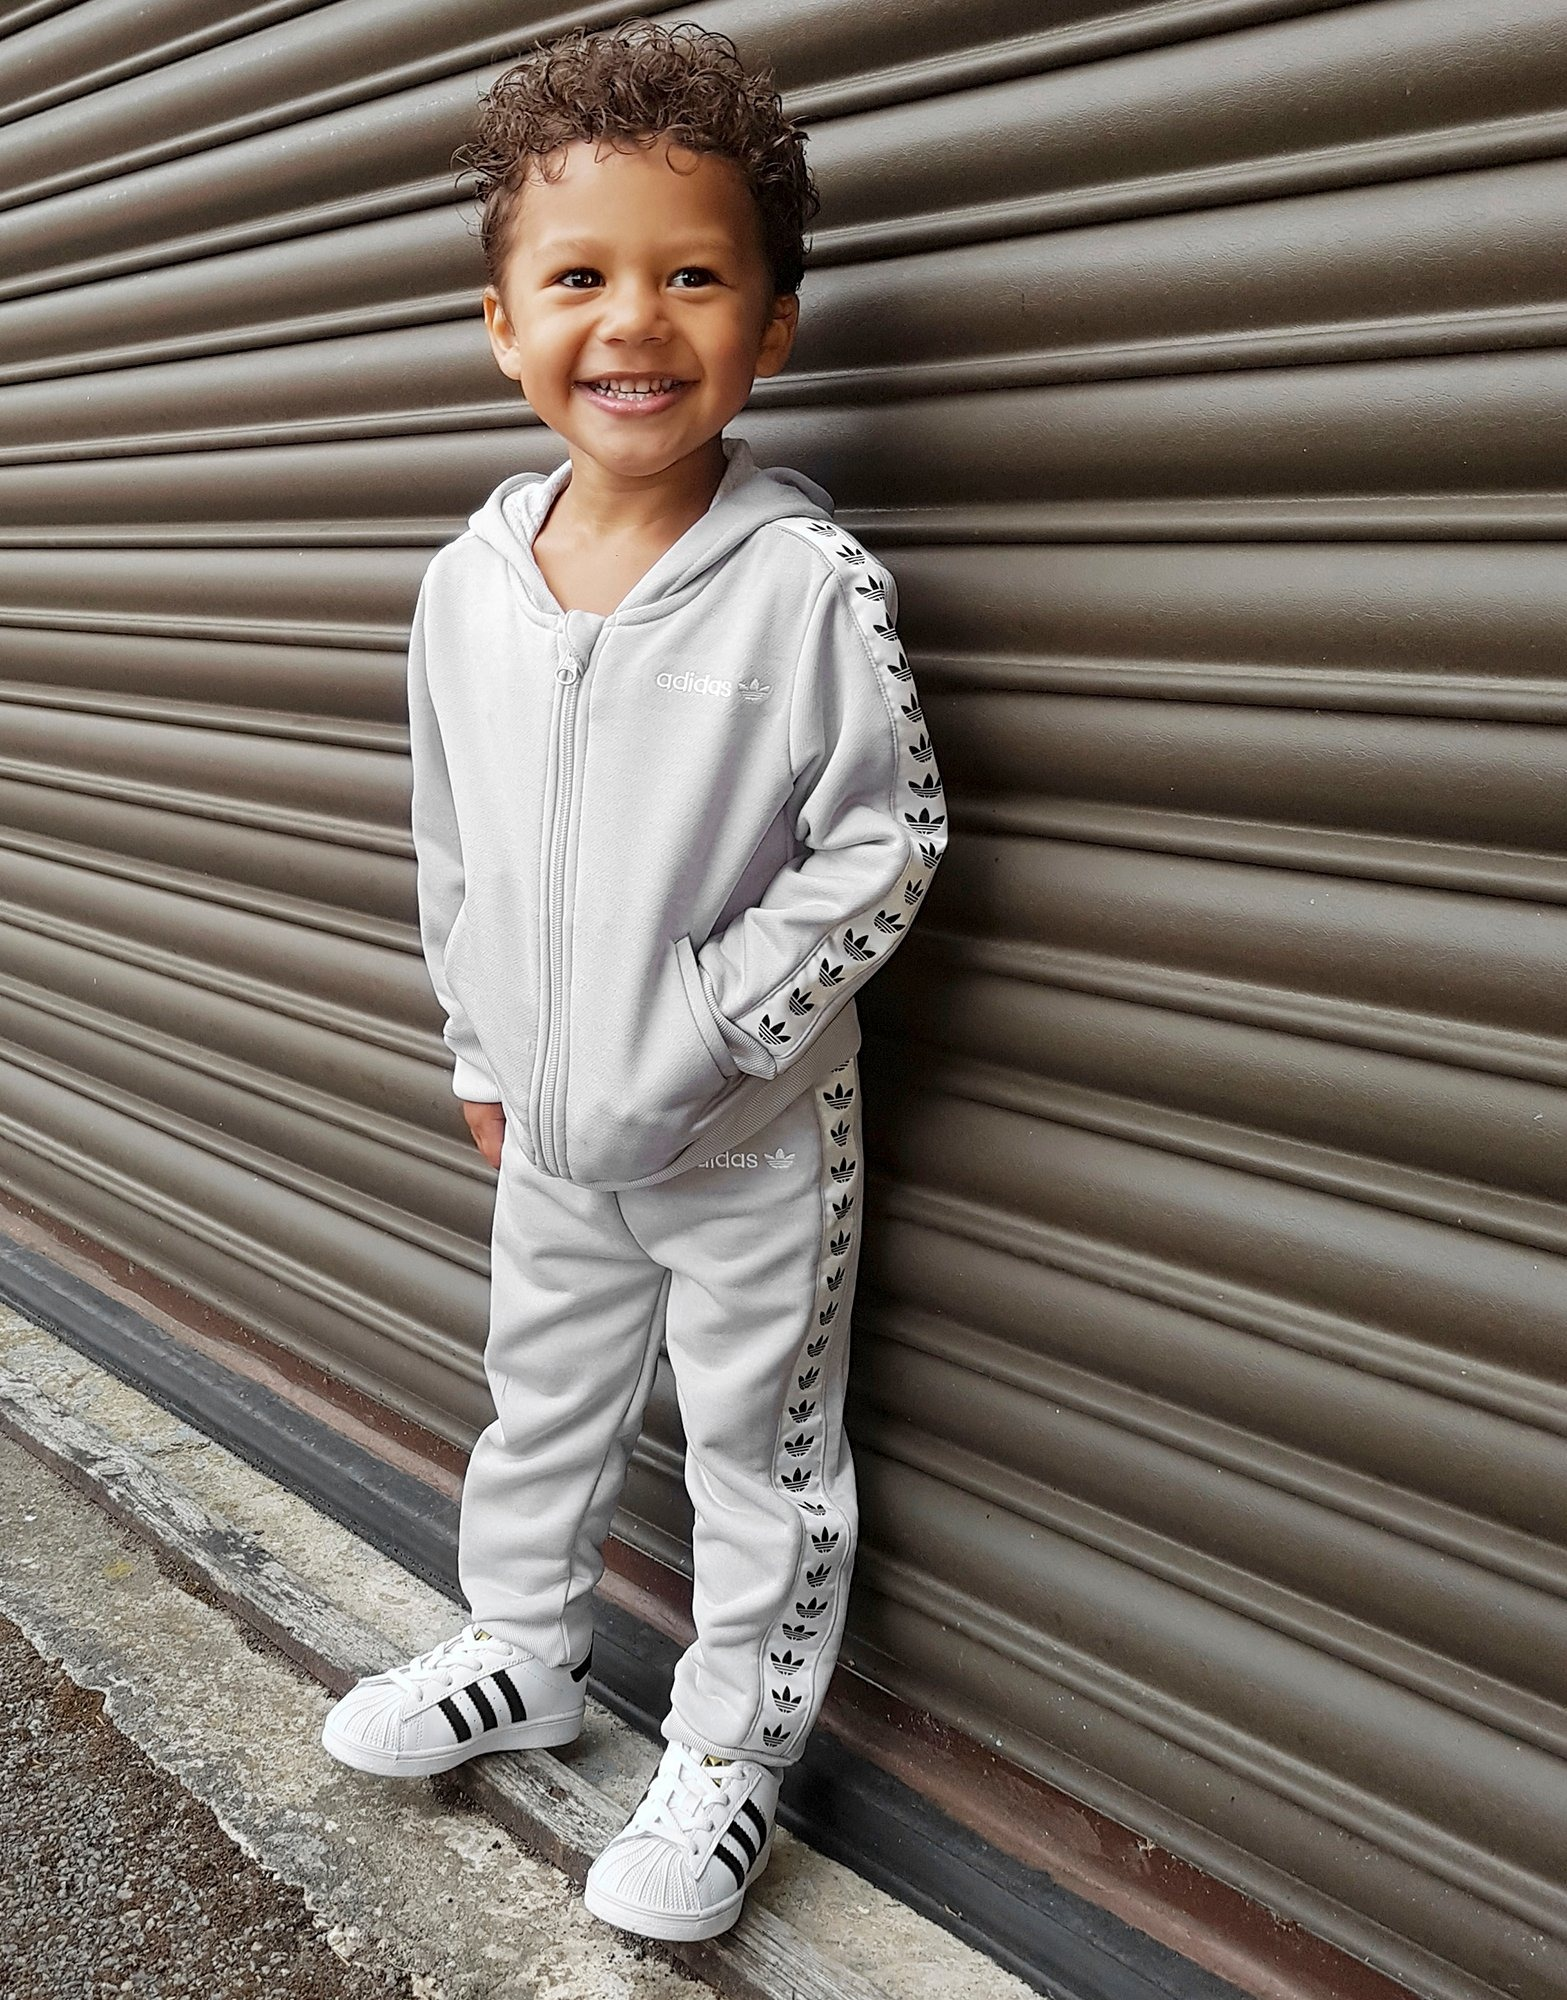 Black Adidas Infants Manchester United Tracksuit